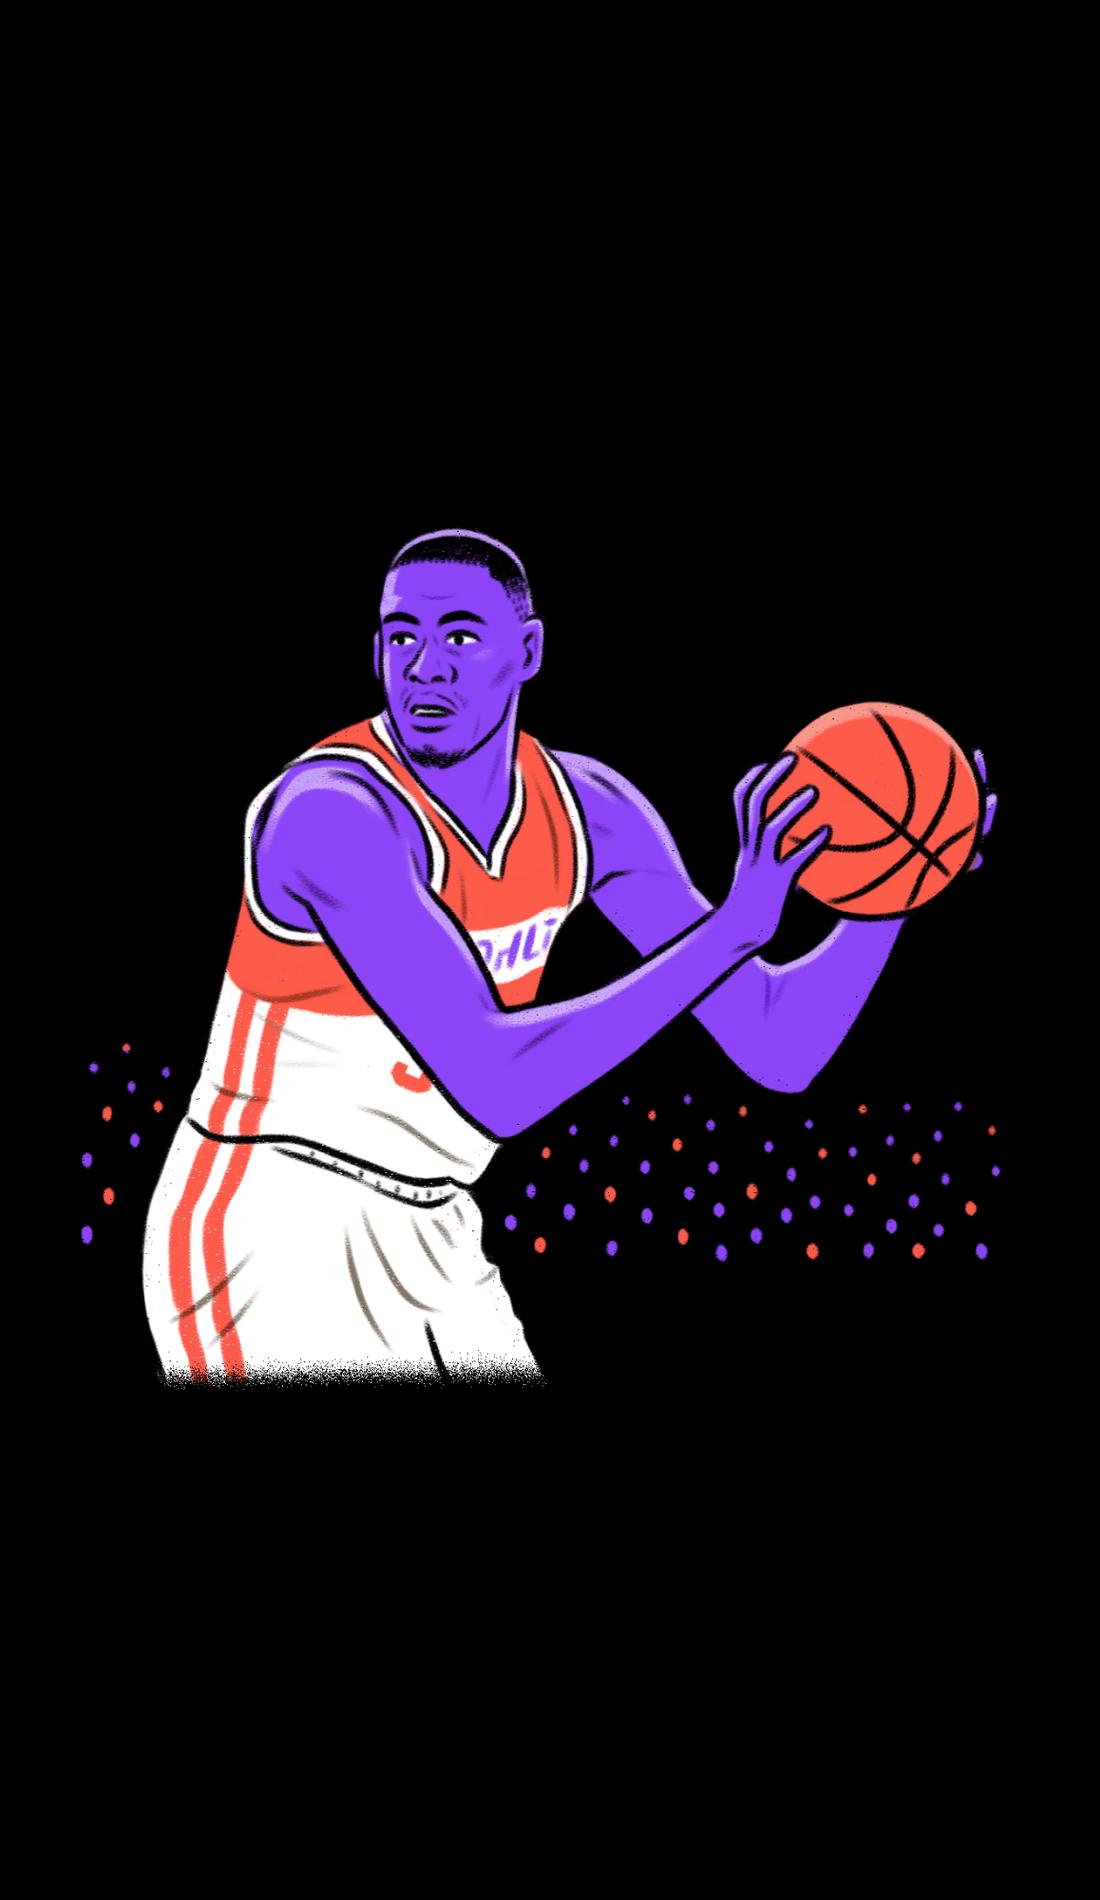 A Baylor Bears Basketball live event